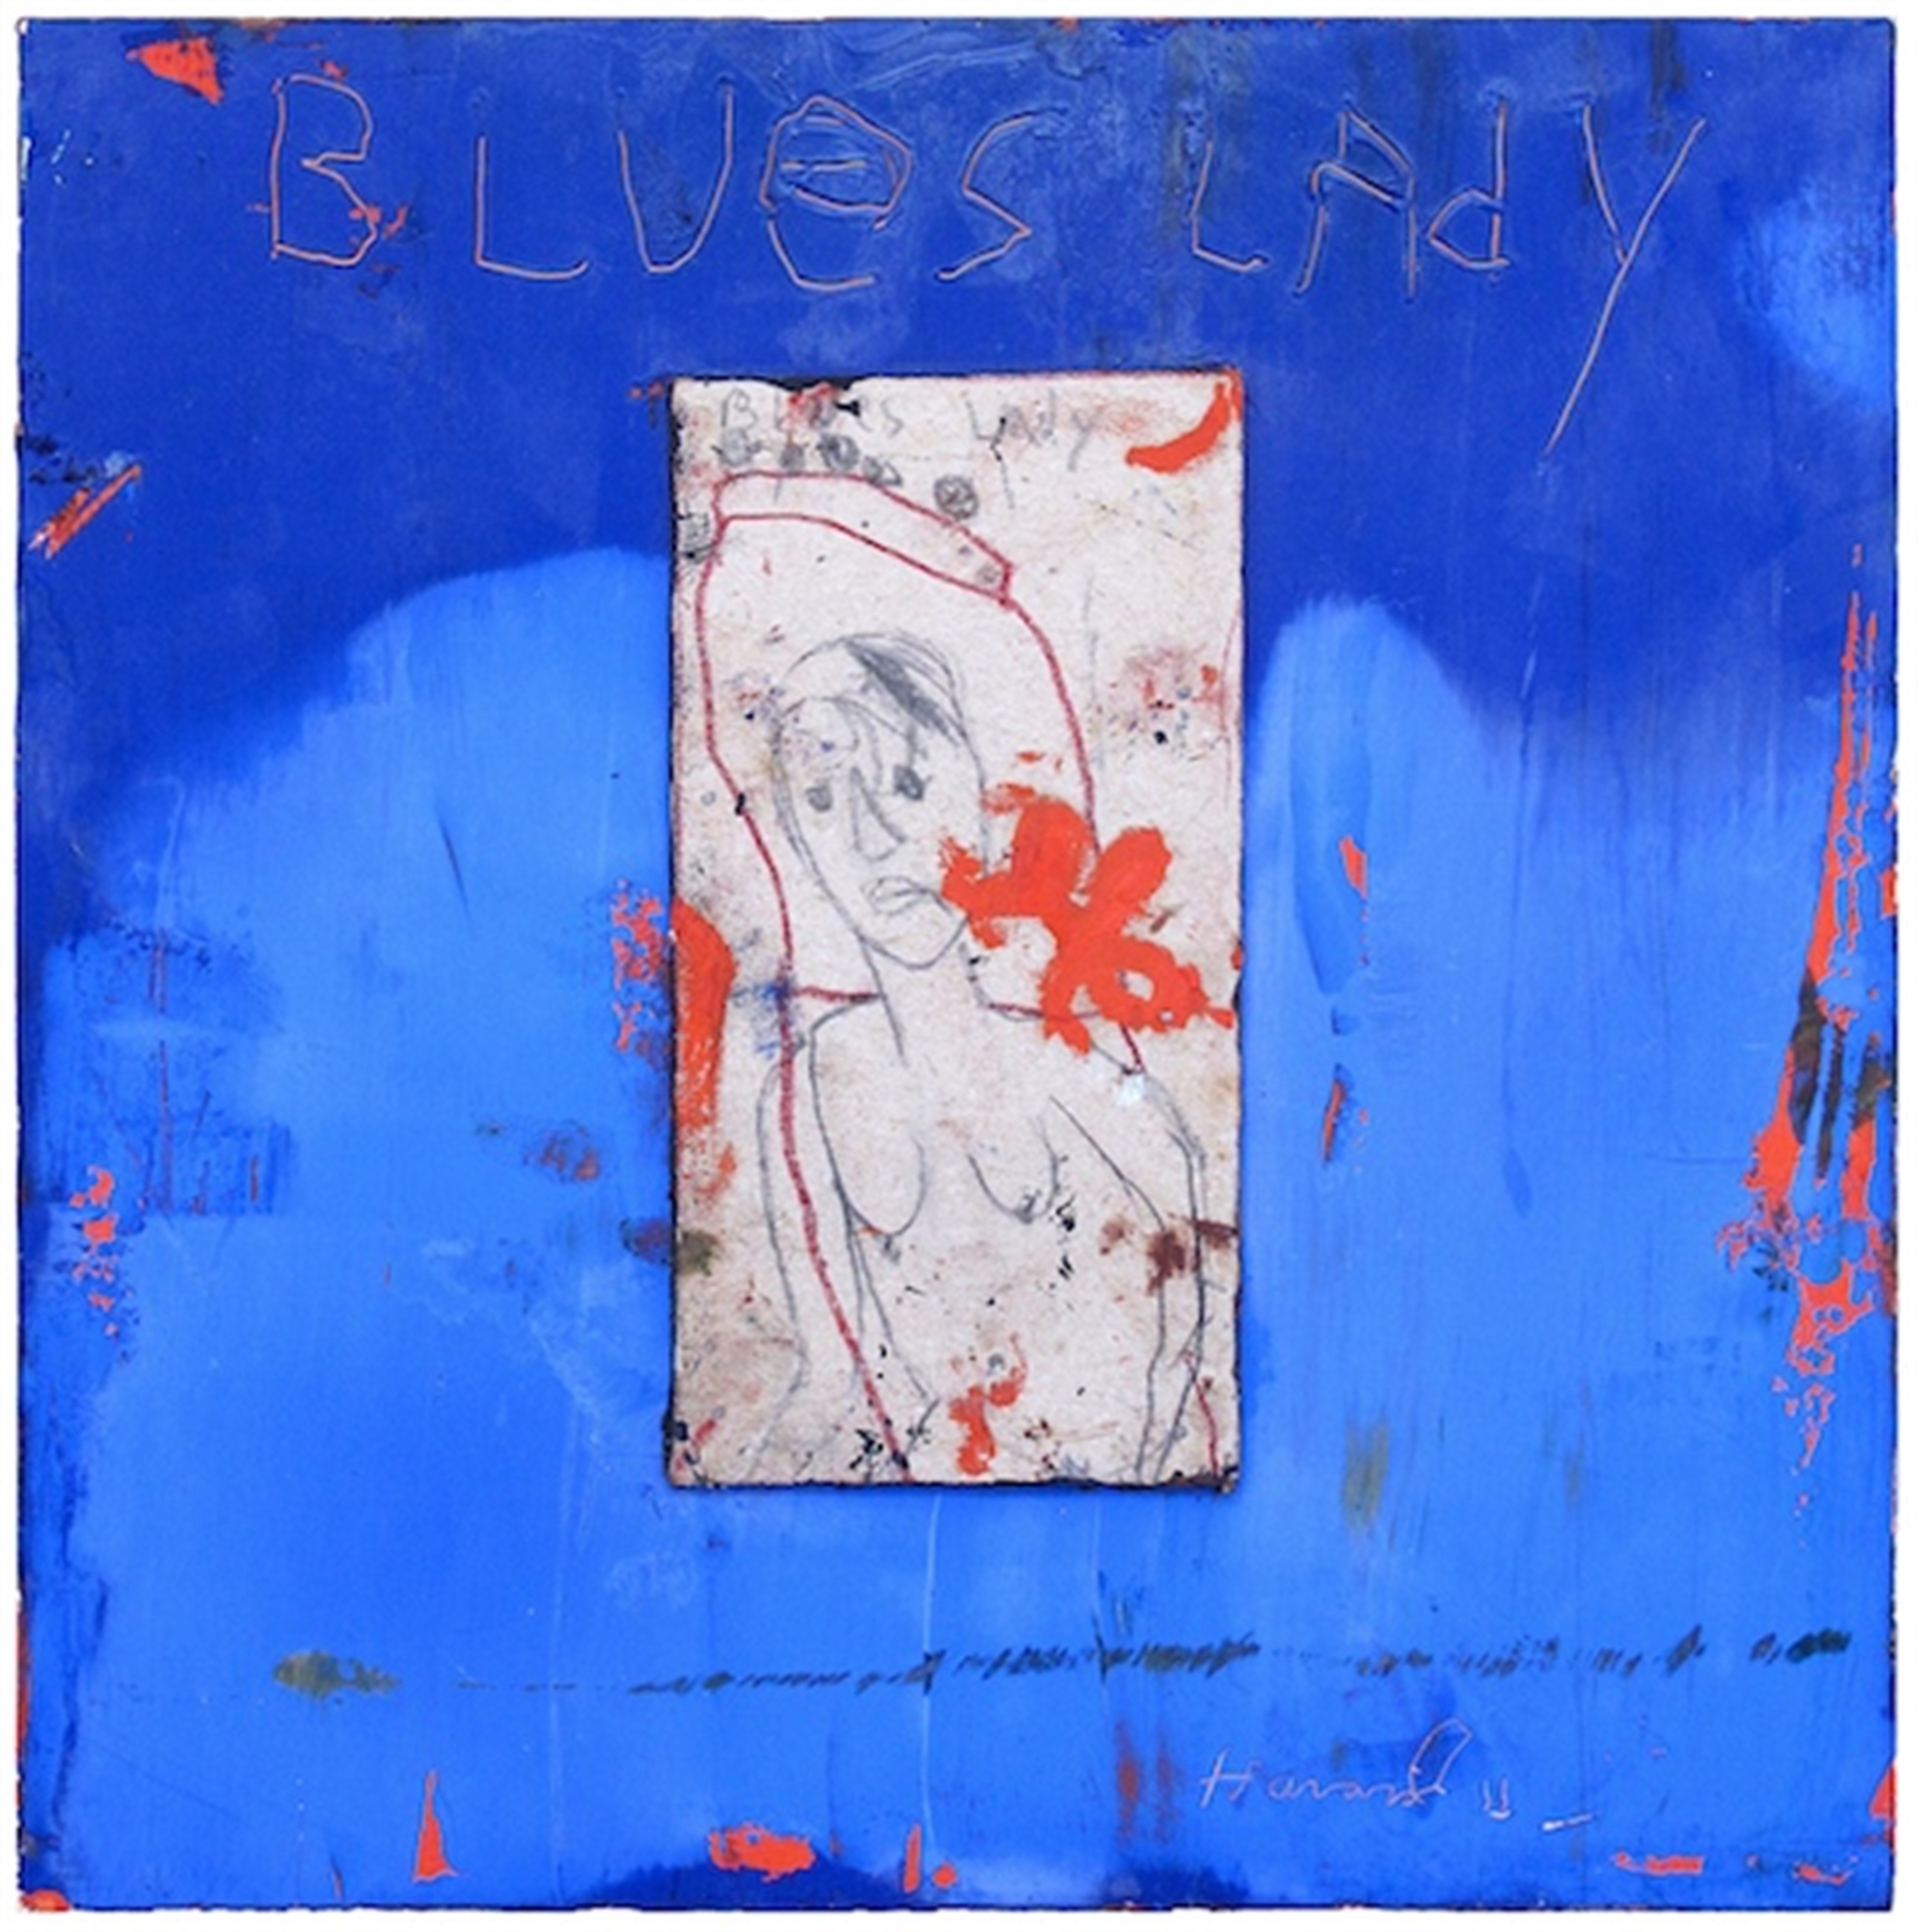 Blues Lady by James Havard